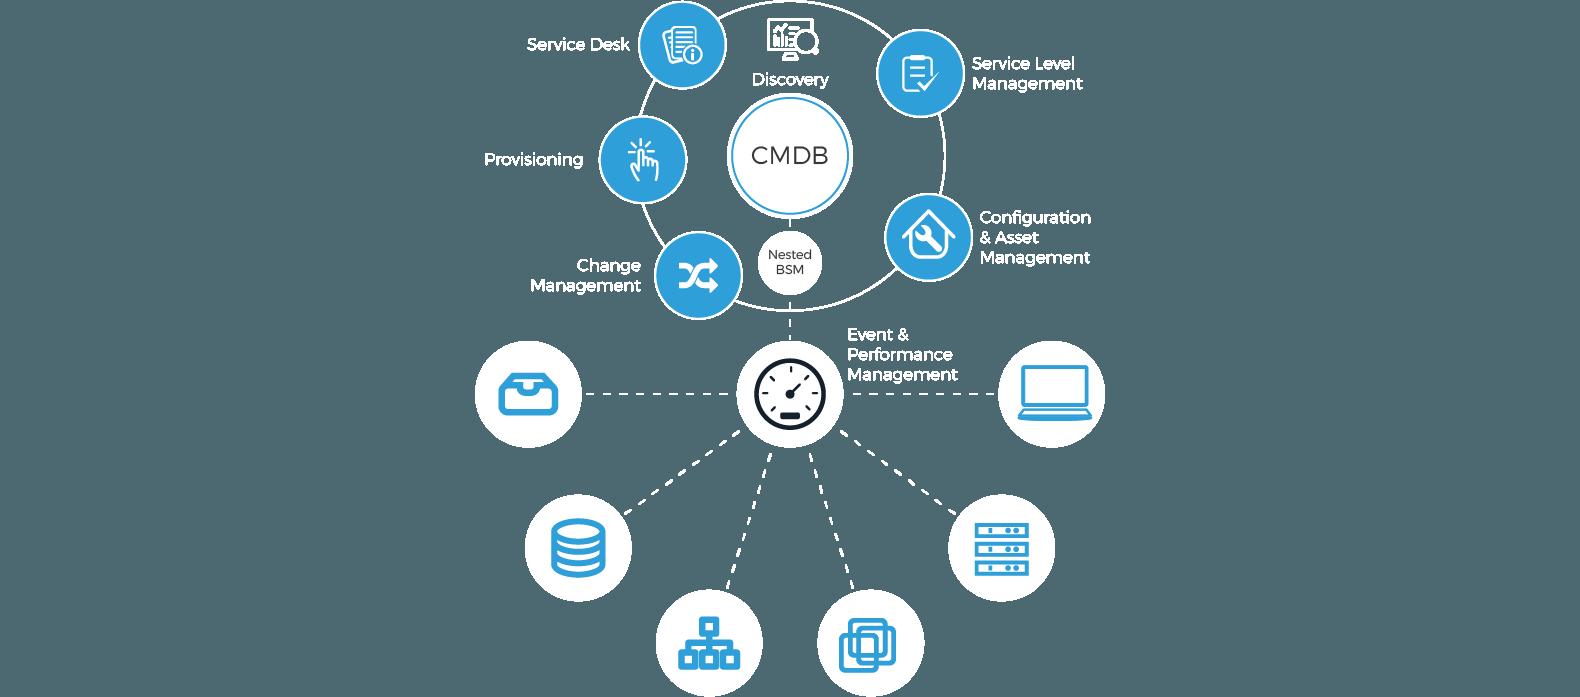 Business Service Management Architecture